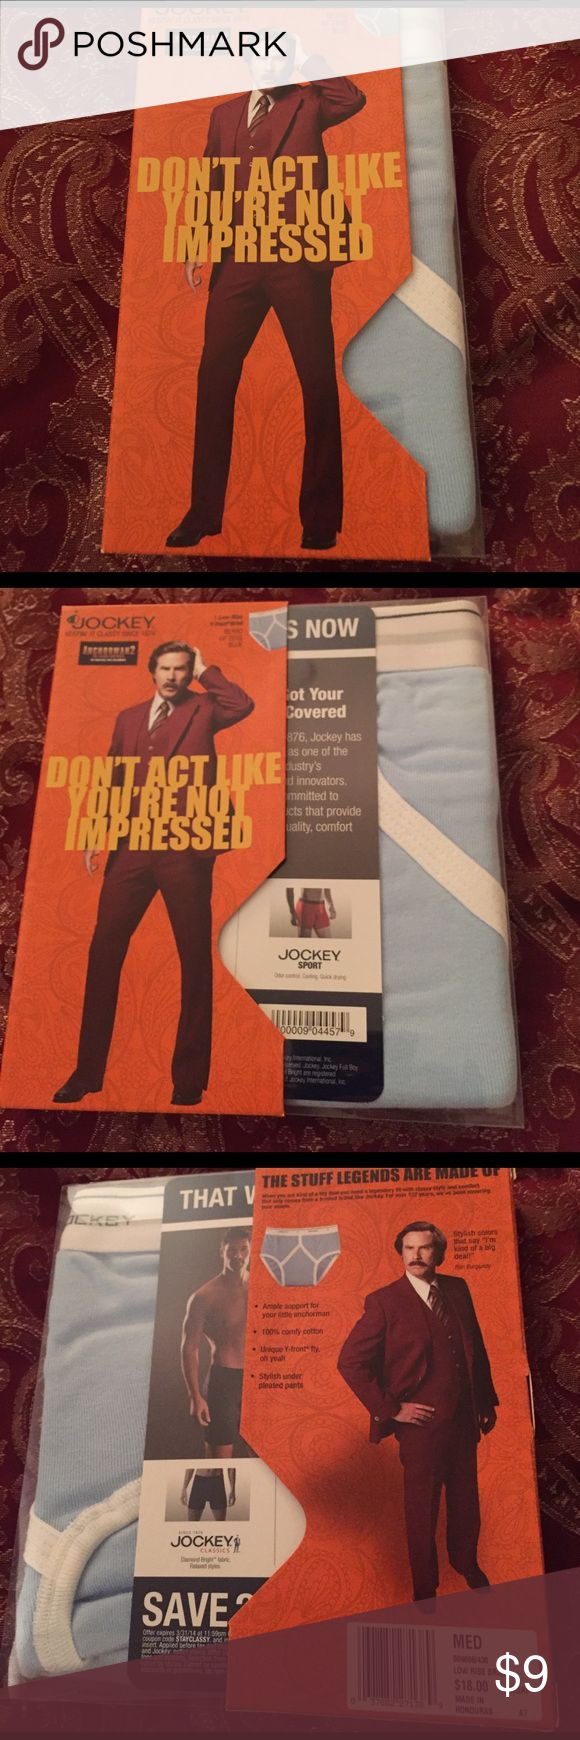 Jockey Men's Low Rise Brief Underwear Anchorman Men's Jockey Low Rise Brief Underwear...Size Medium...light blue...made in Honduras....100% cotton.....in Anchorman 2 special edition box! Jockey Underwear & Socks Briefs